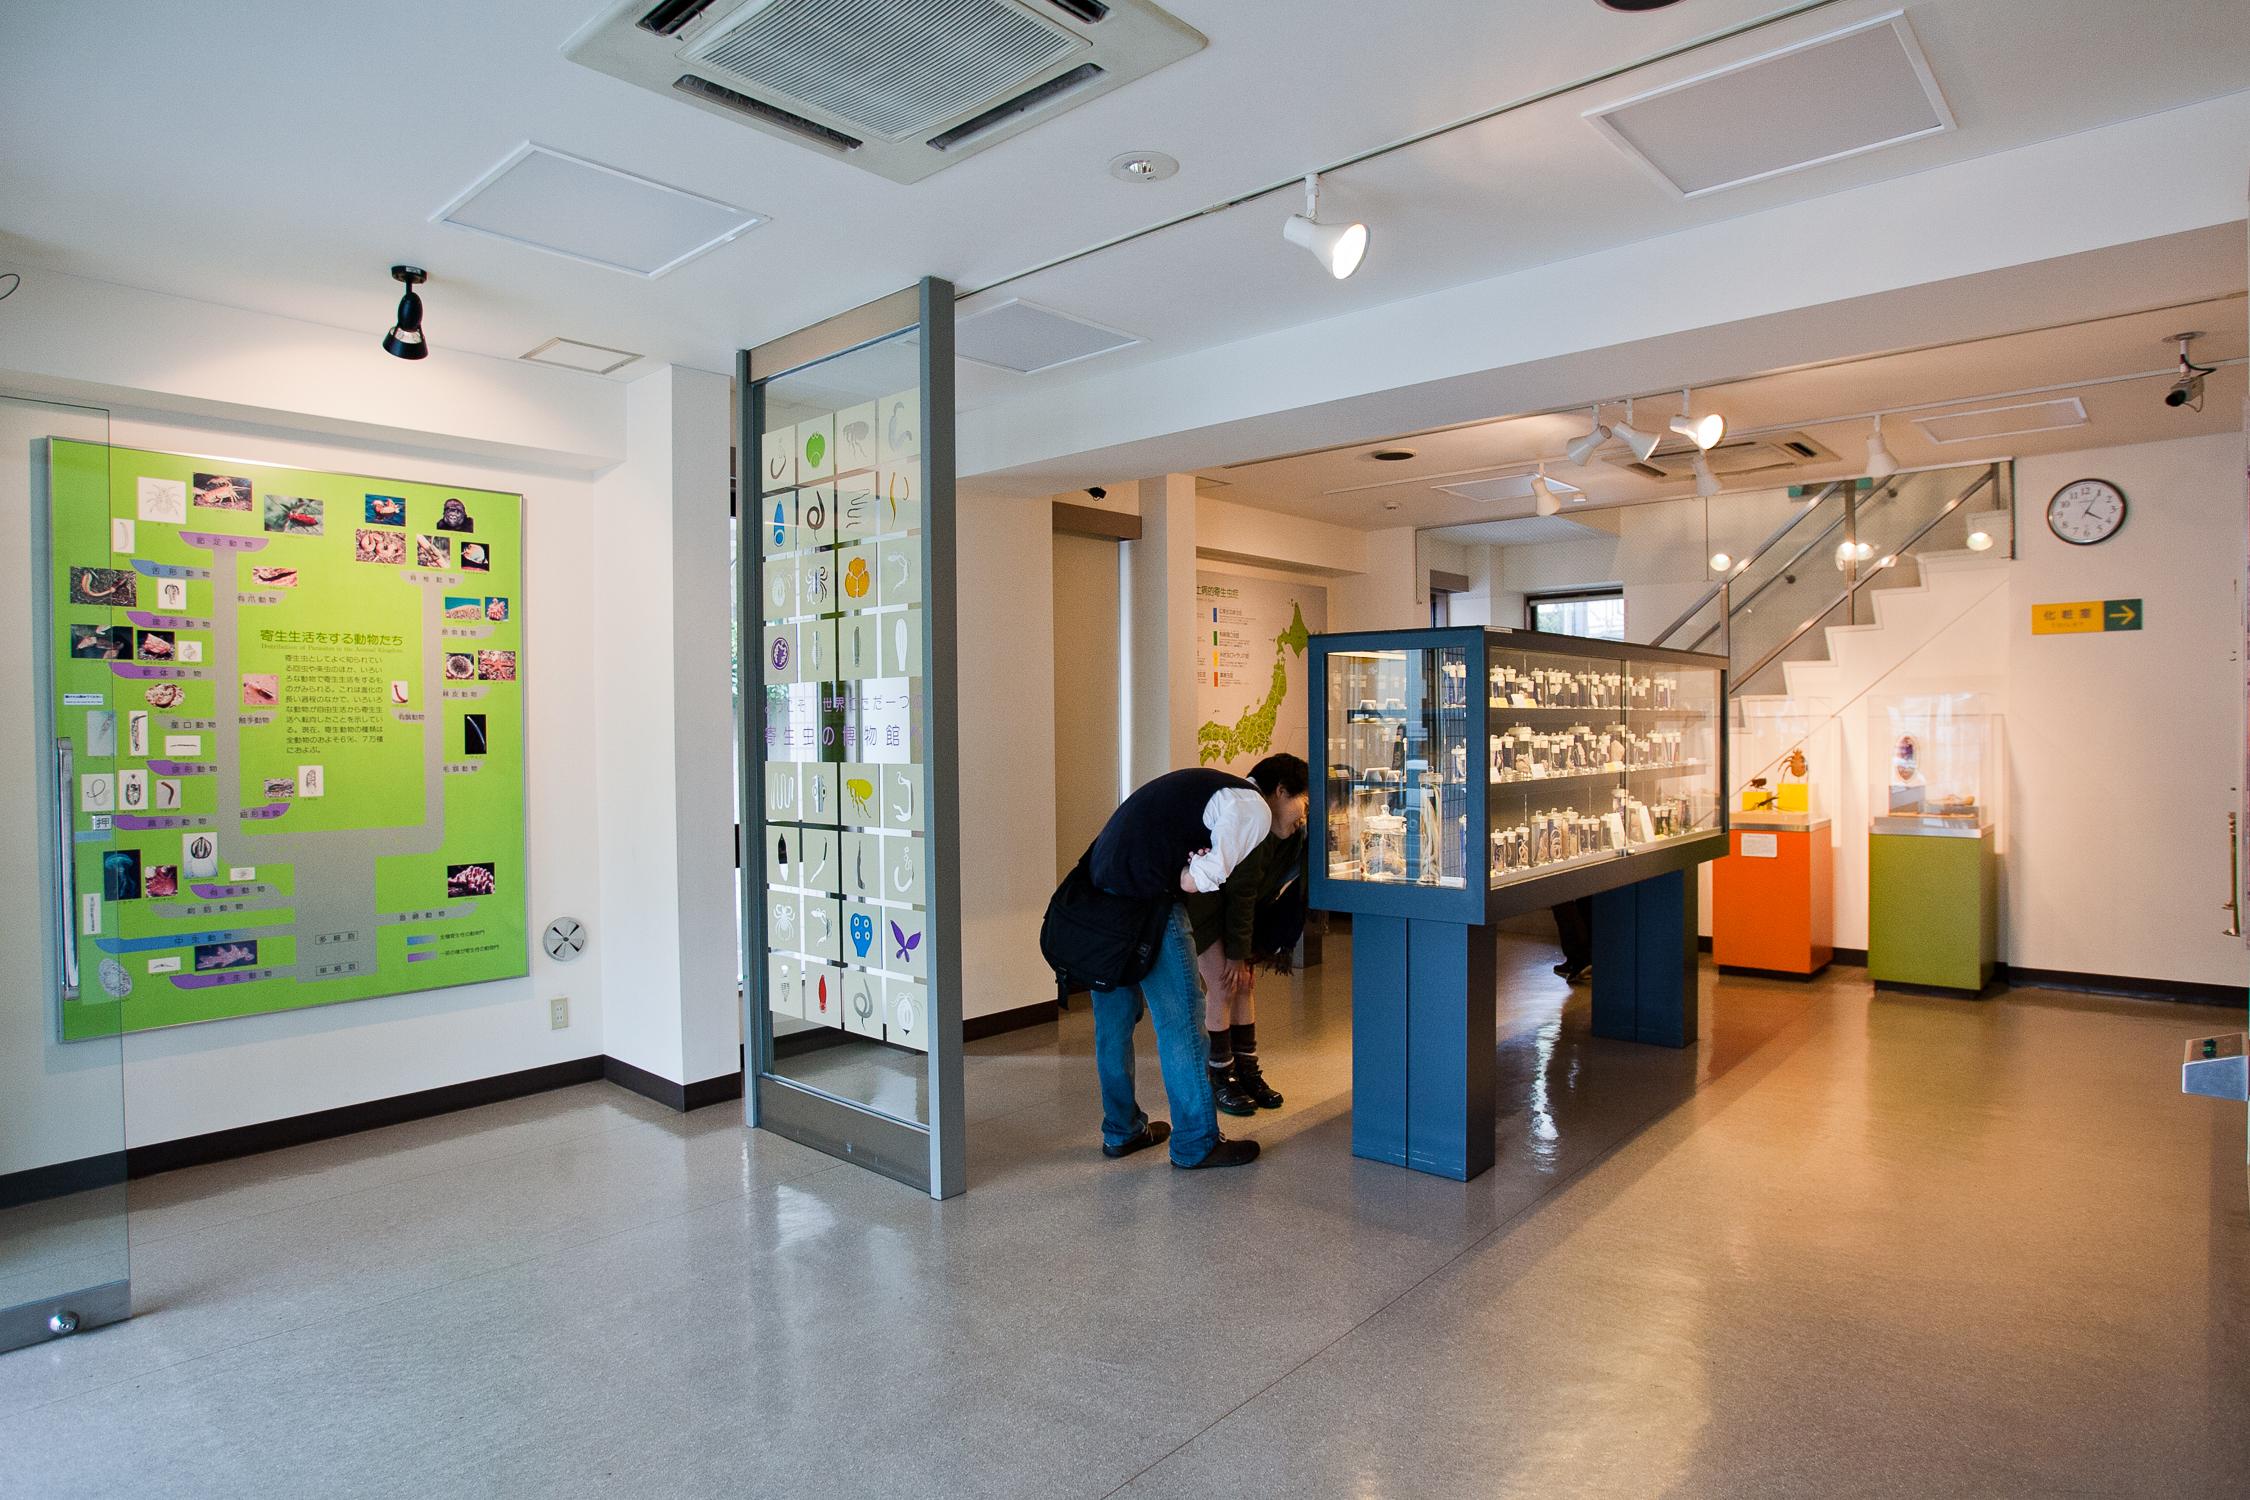 20110423_Meguro_Parasite_Museum_MG_3236.jpg